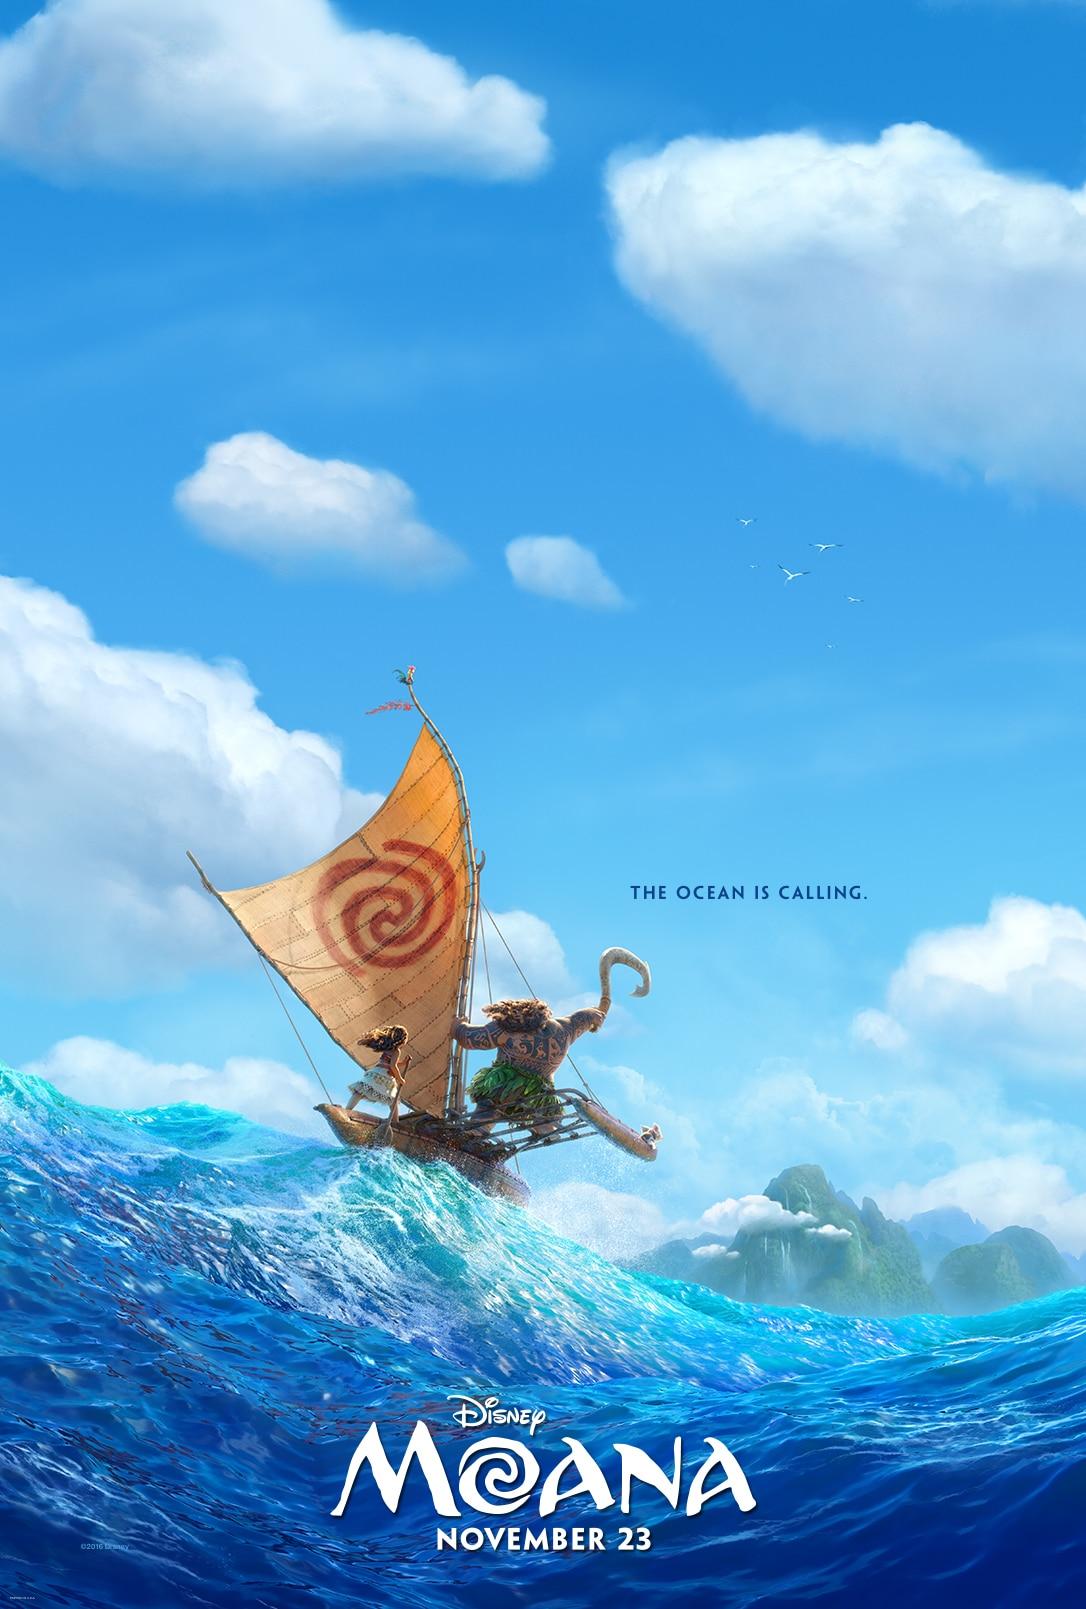 Disney's Moana in theaters Nov. 23rd